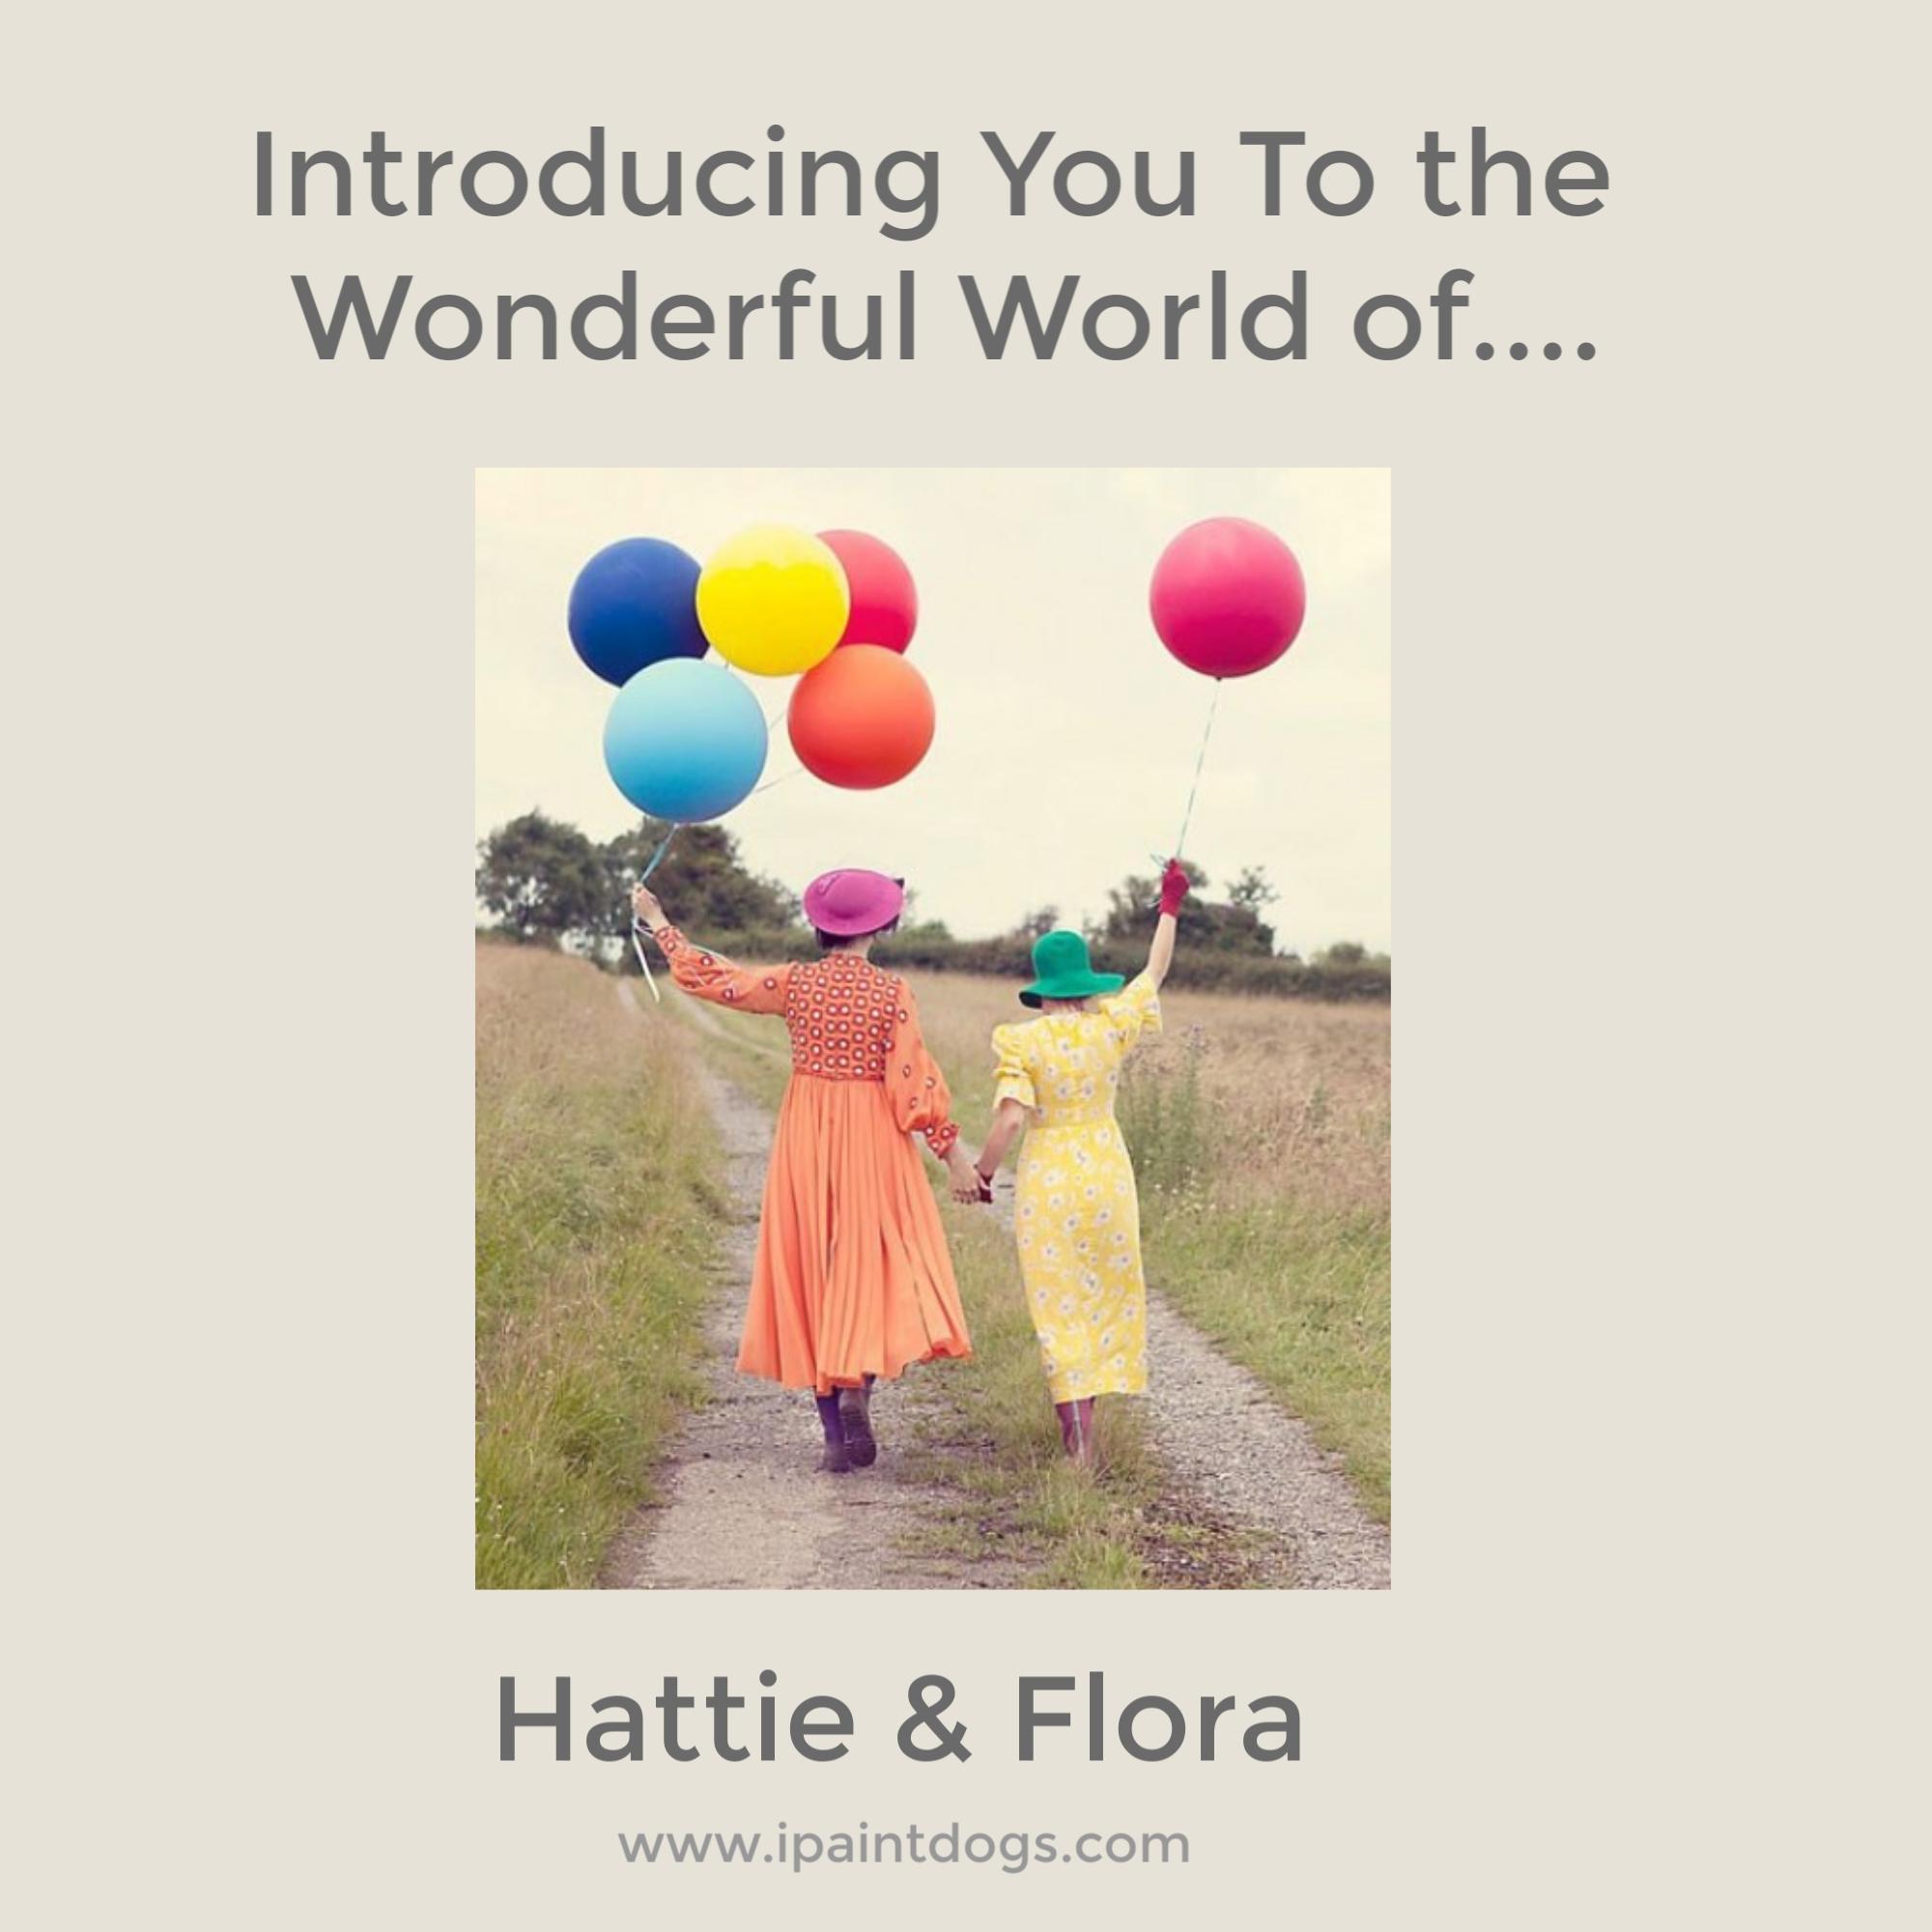 Samantha Barnes is ipaintdogs, introducing Hattie & Flora Styling Design, UK